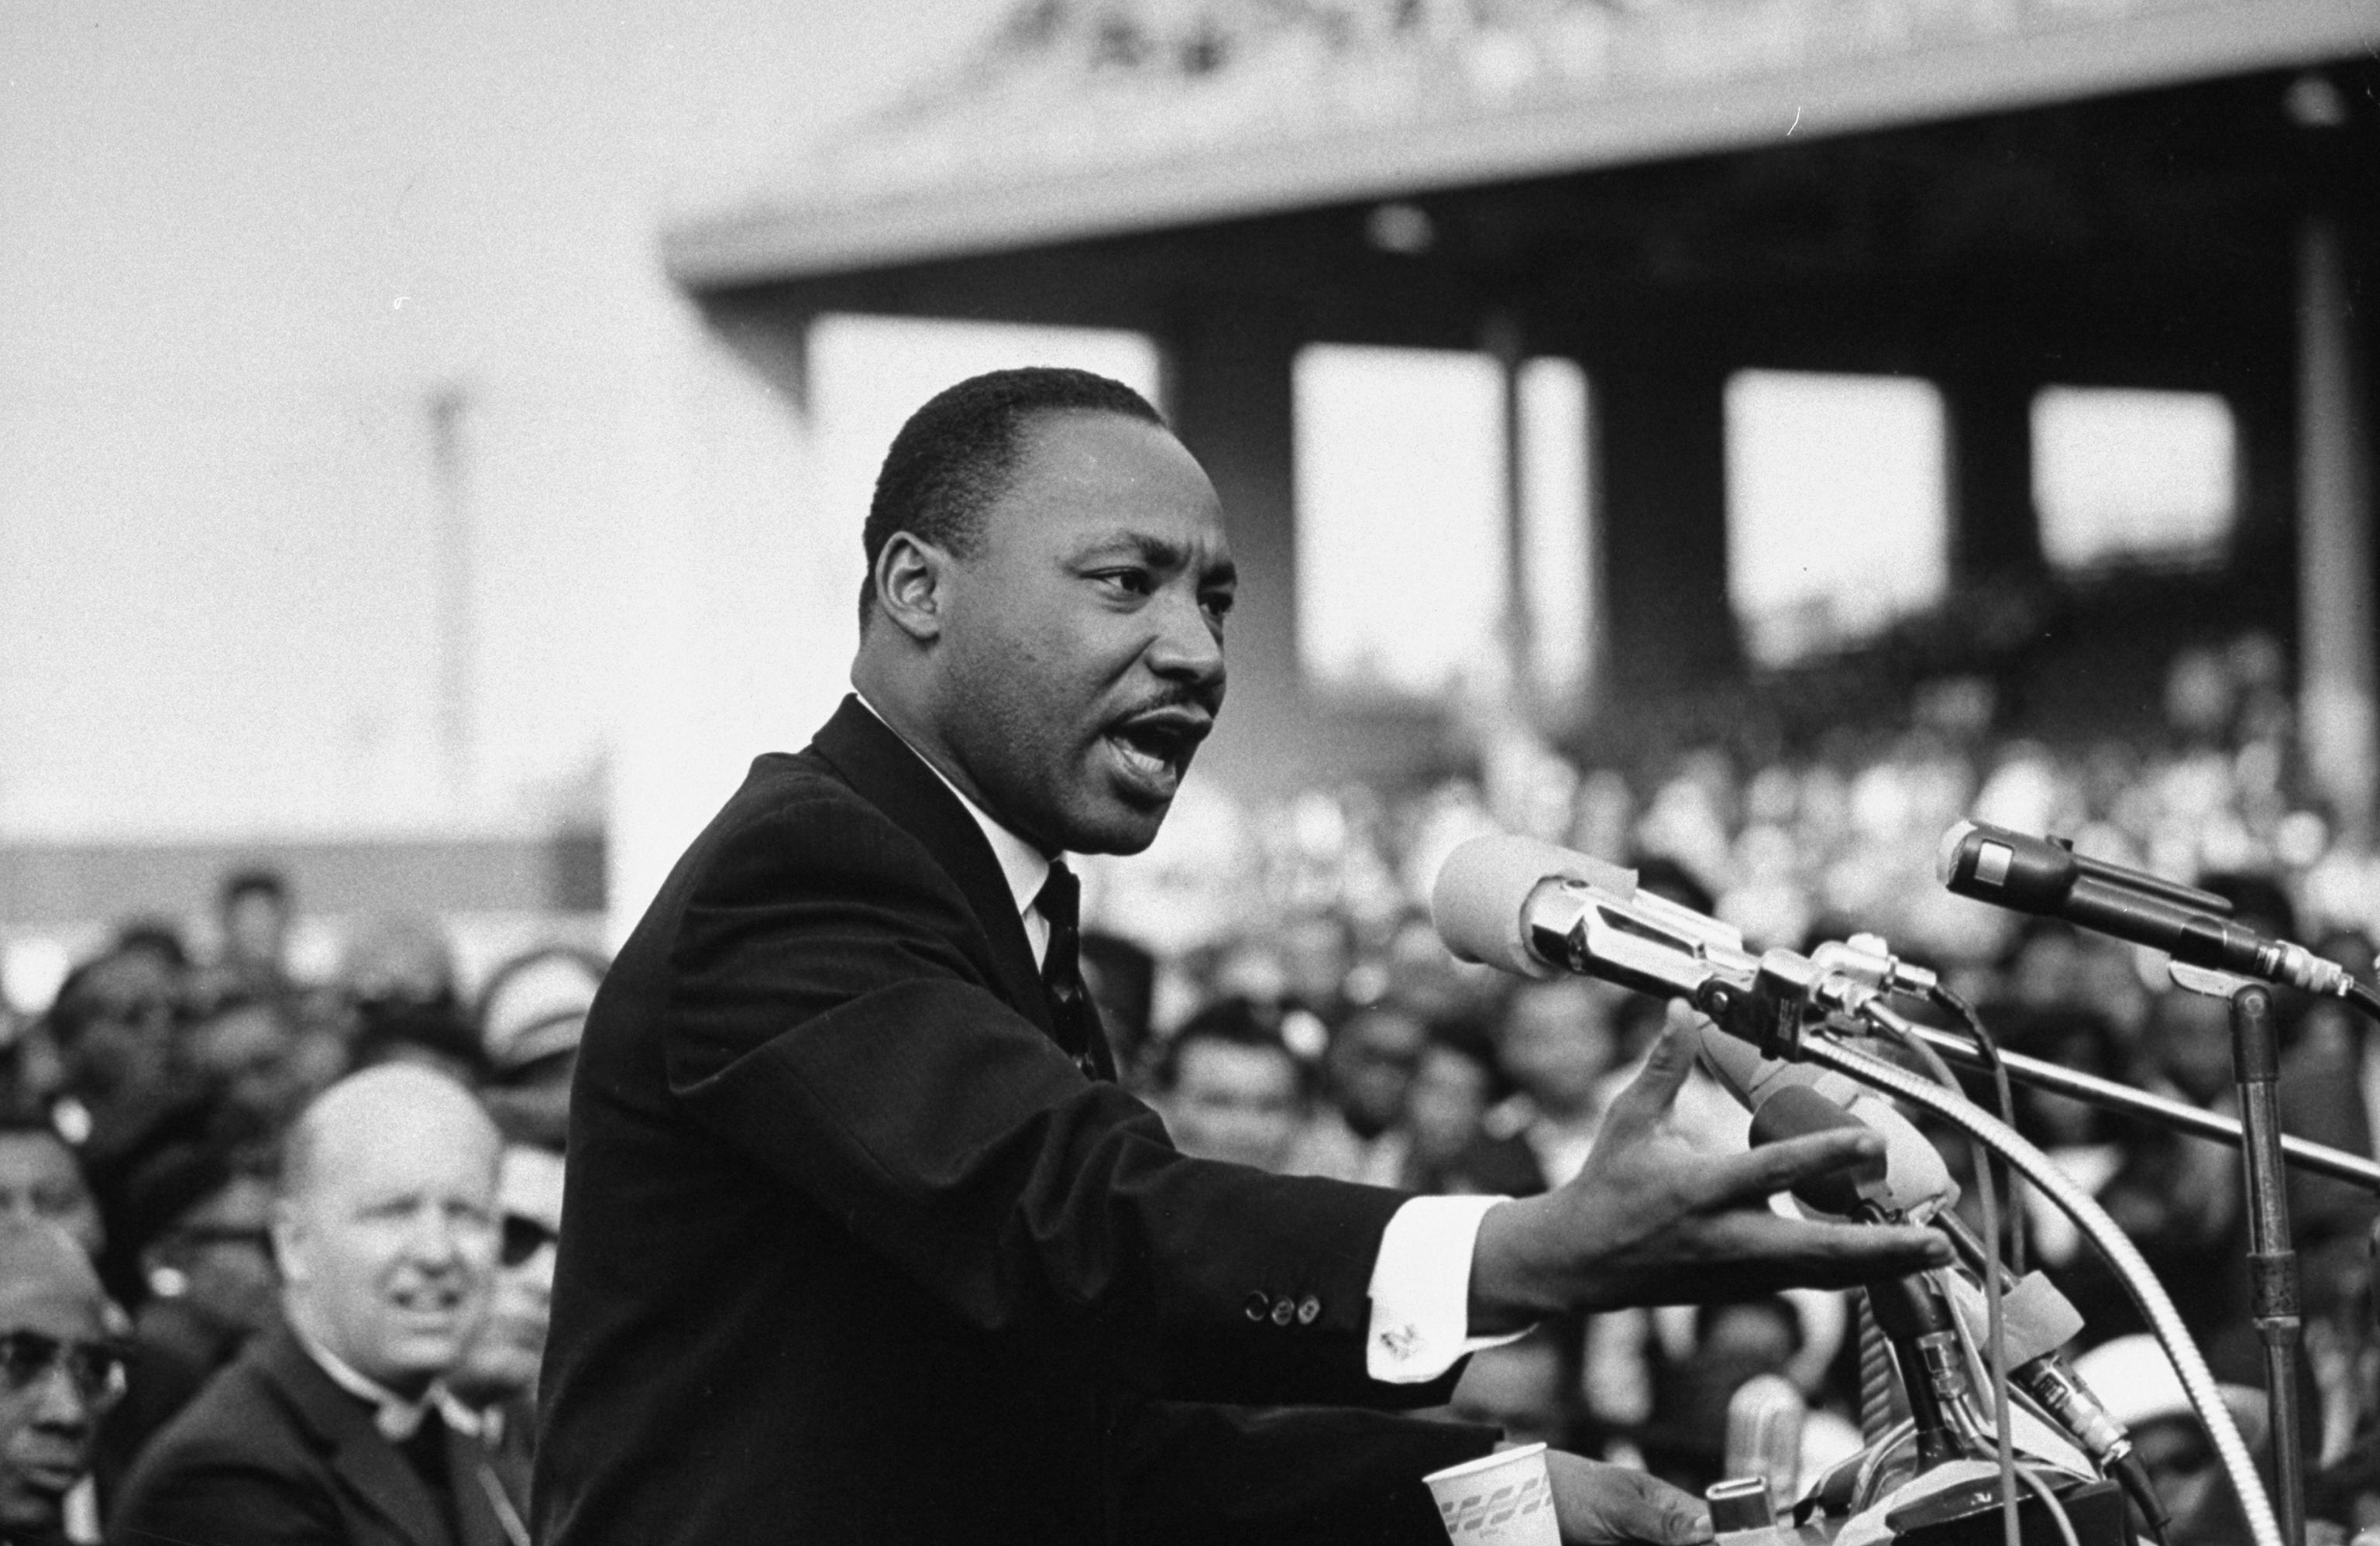 Rev. Dr. Martin Luther King Jr. speaking.